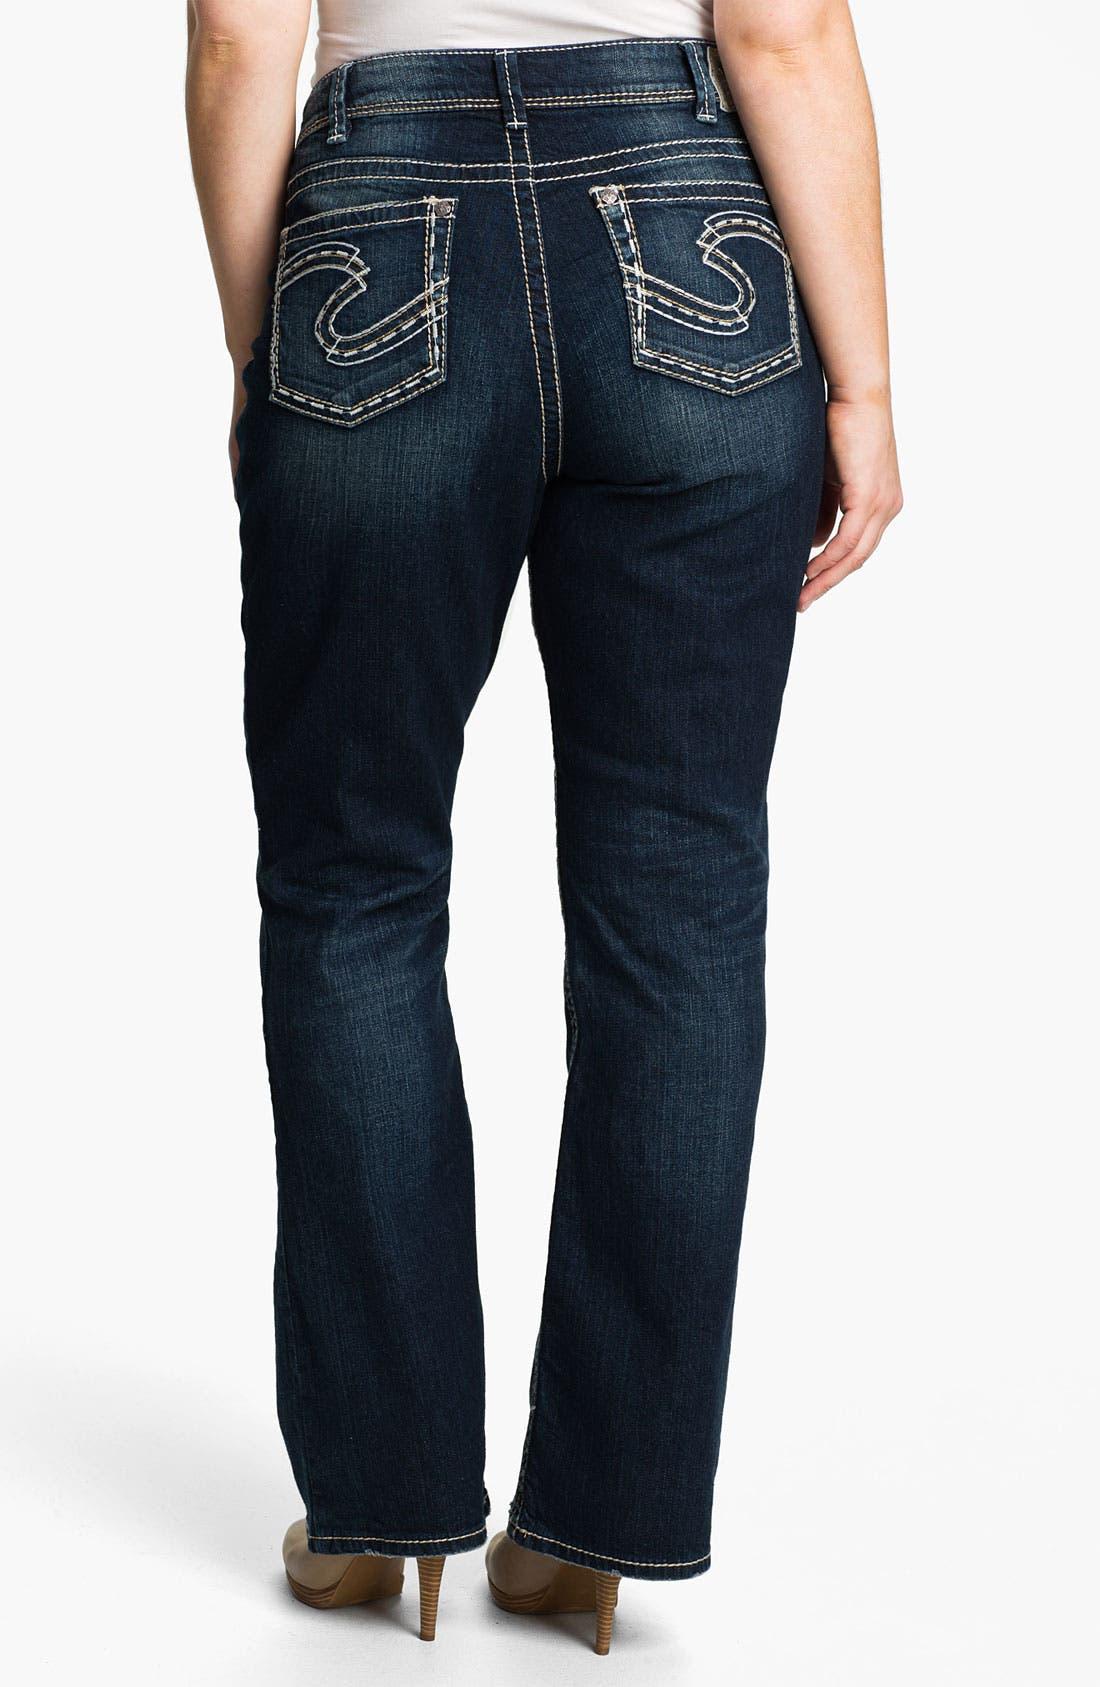 Alternate Image 2  - Silver Jeans Co. 'Suki' Bootcut Jeans (Plus)